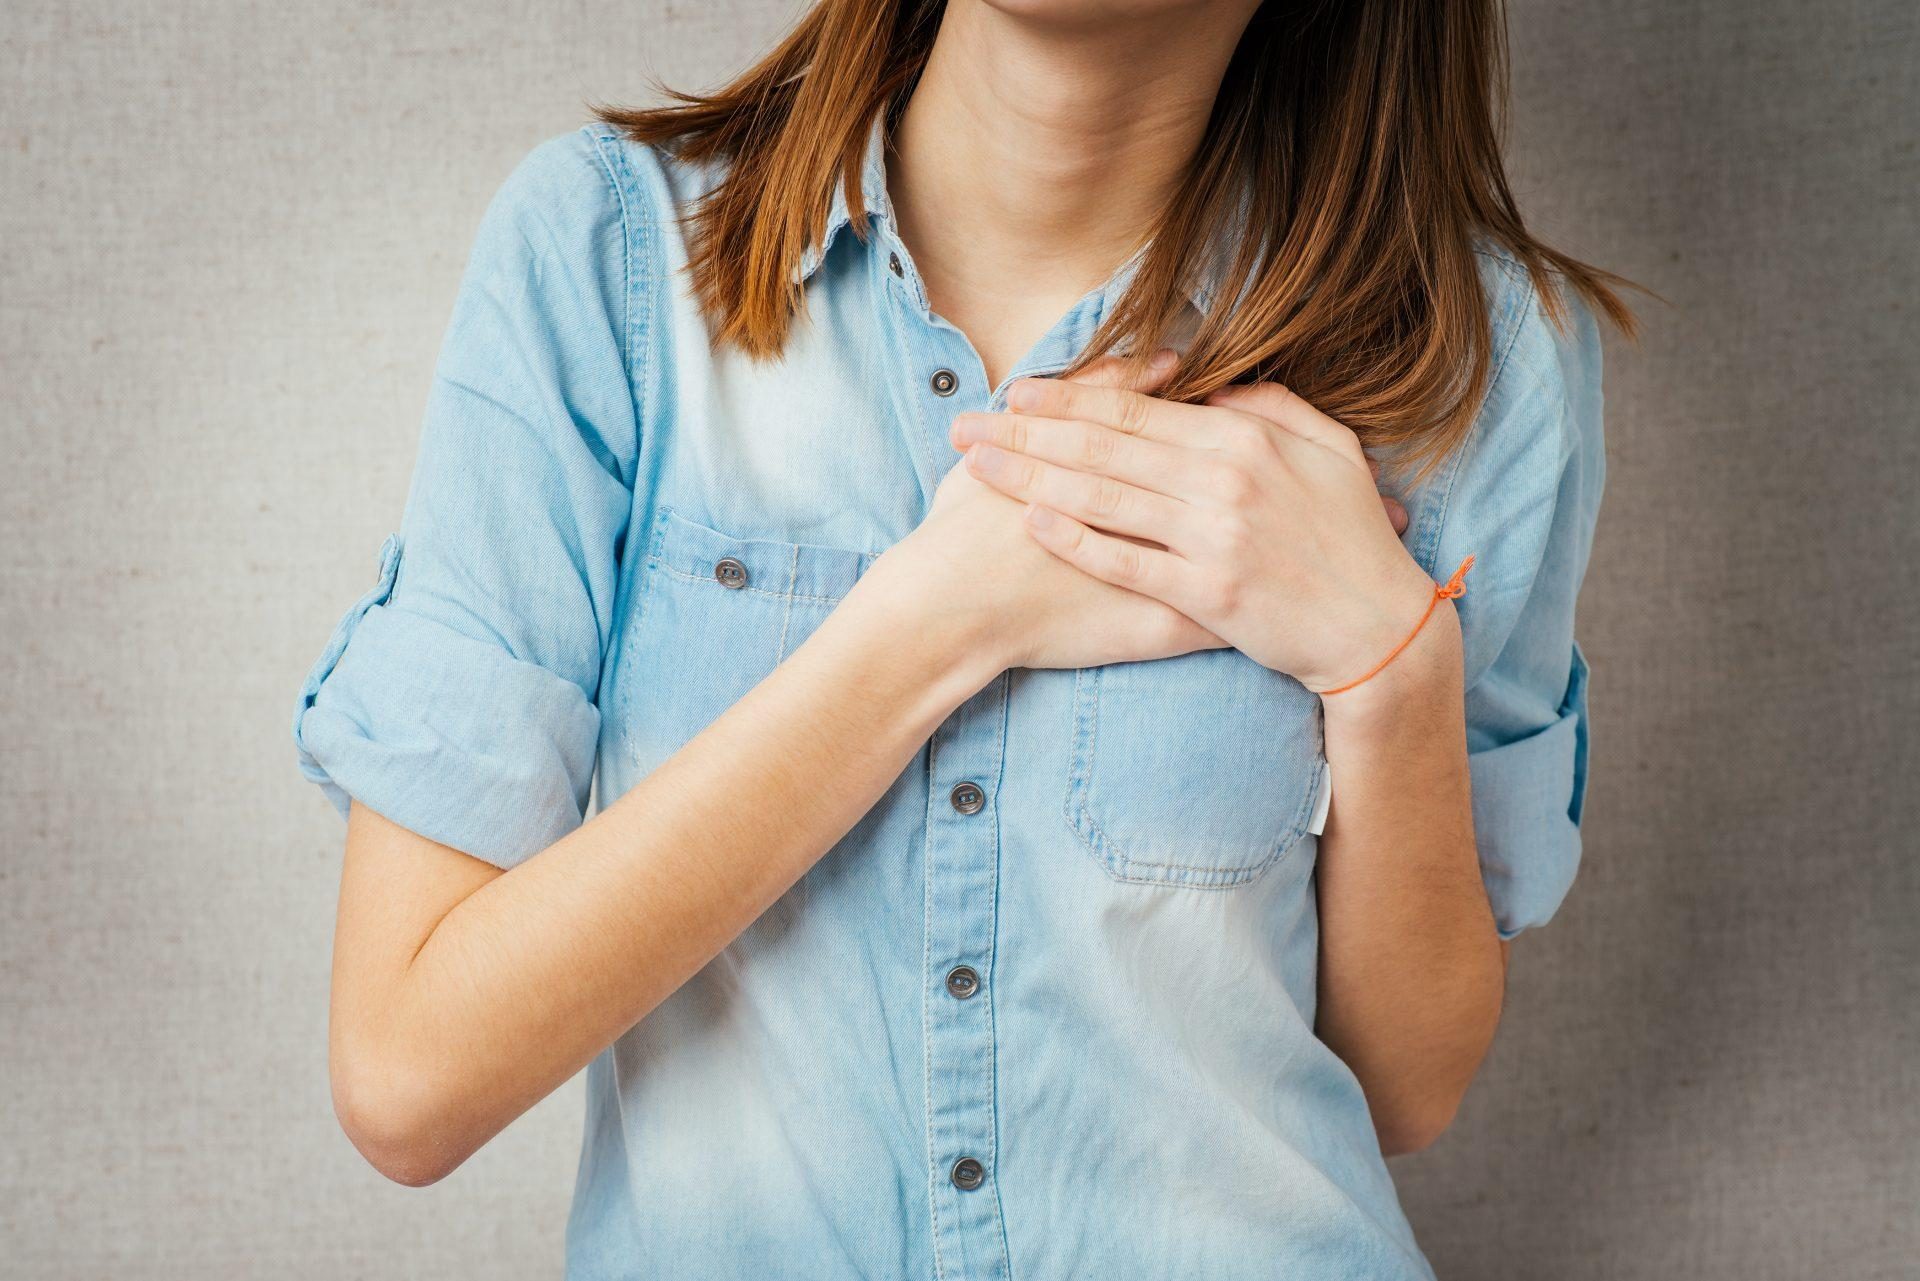 Syndrome Douloureux Post-Mastectomie